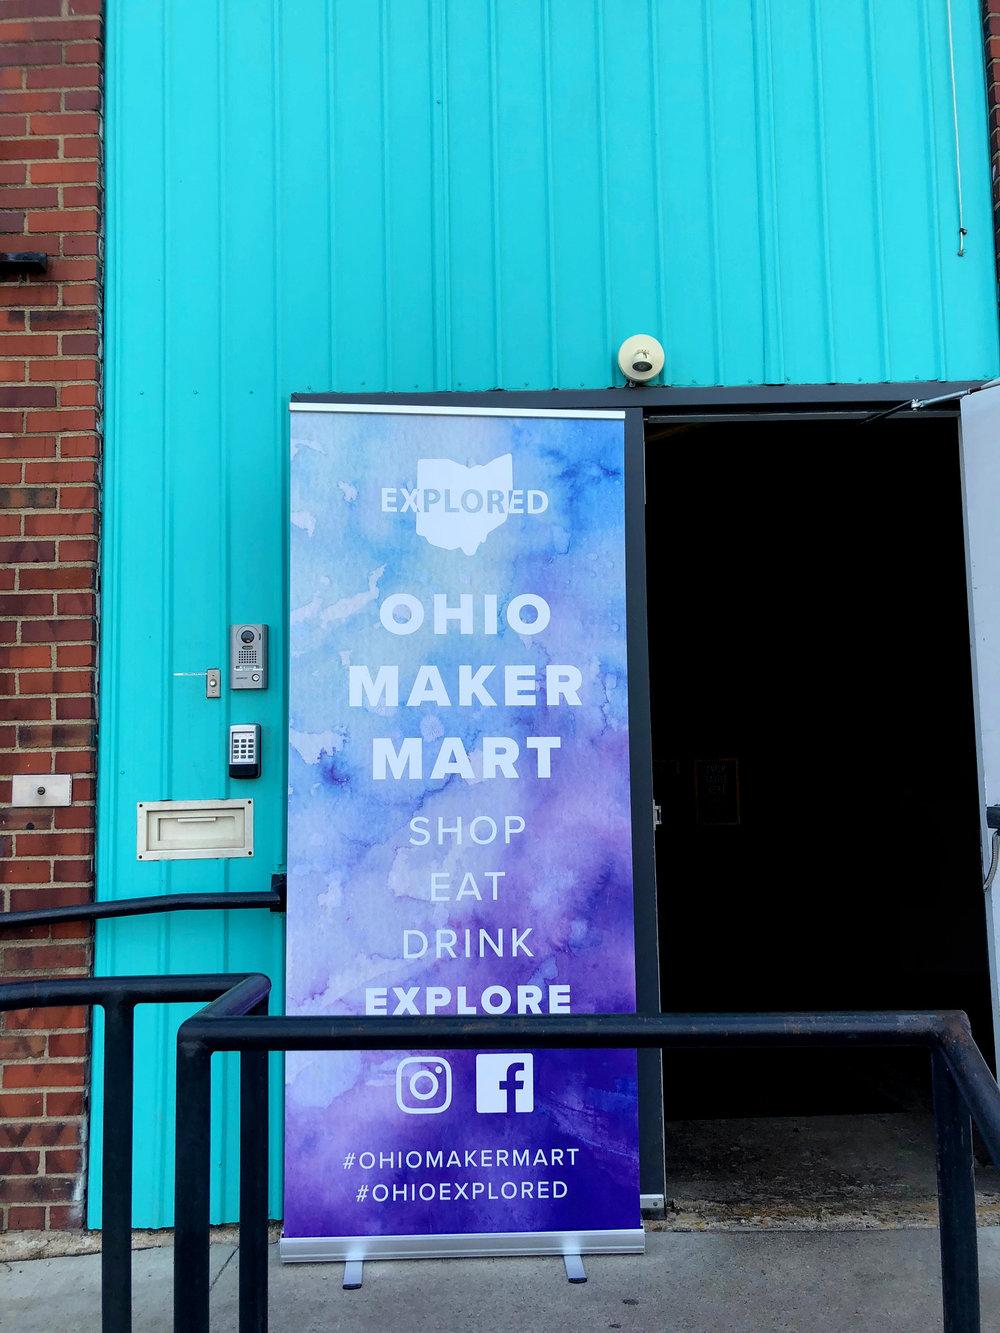 Ohio Maker Mart Ohio Explored